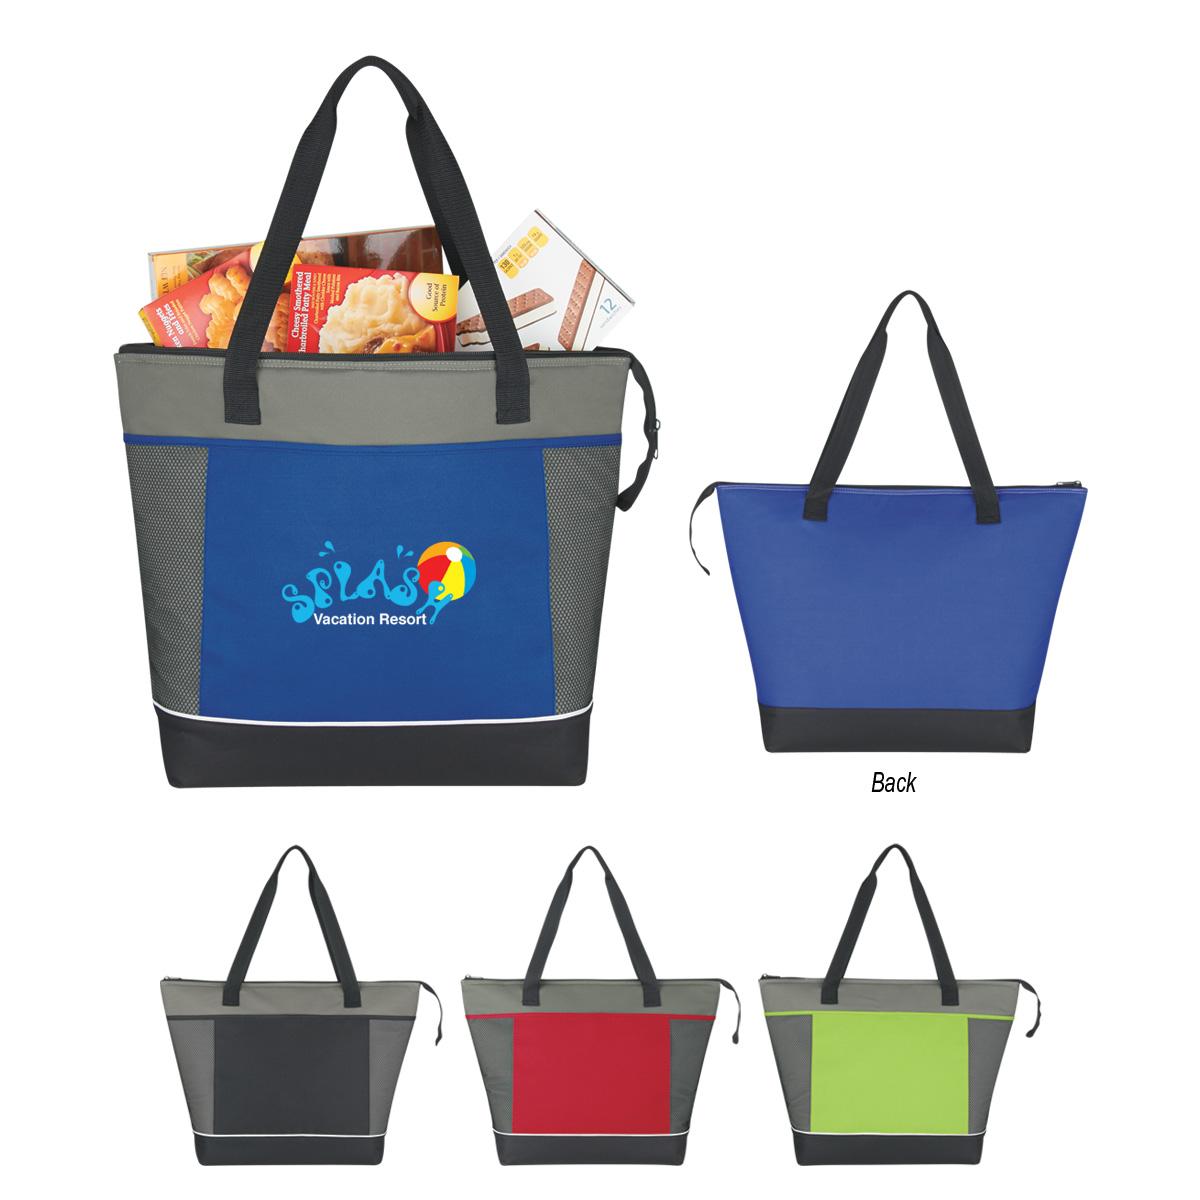 #CM 3558 Mega Shopping Kooler Tote Bag